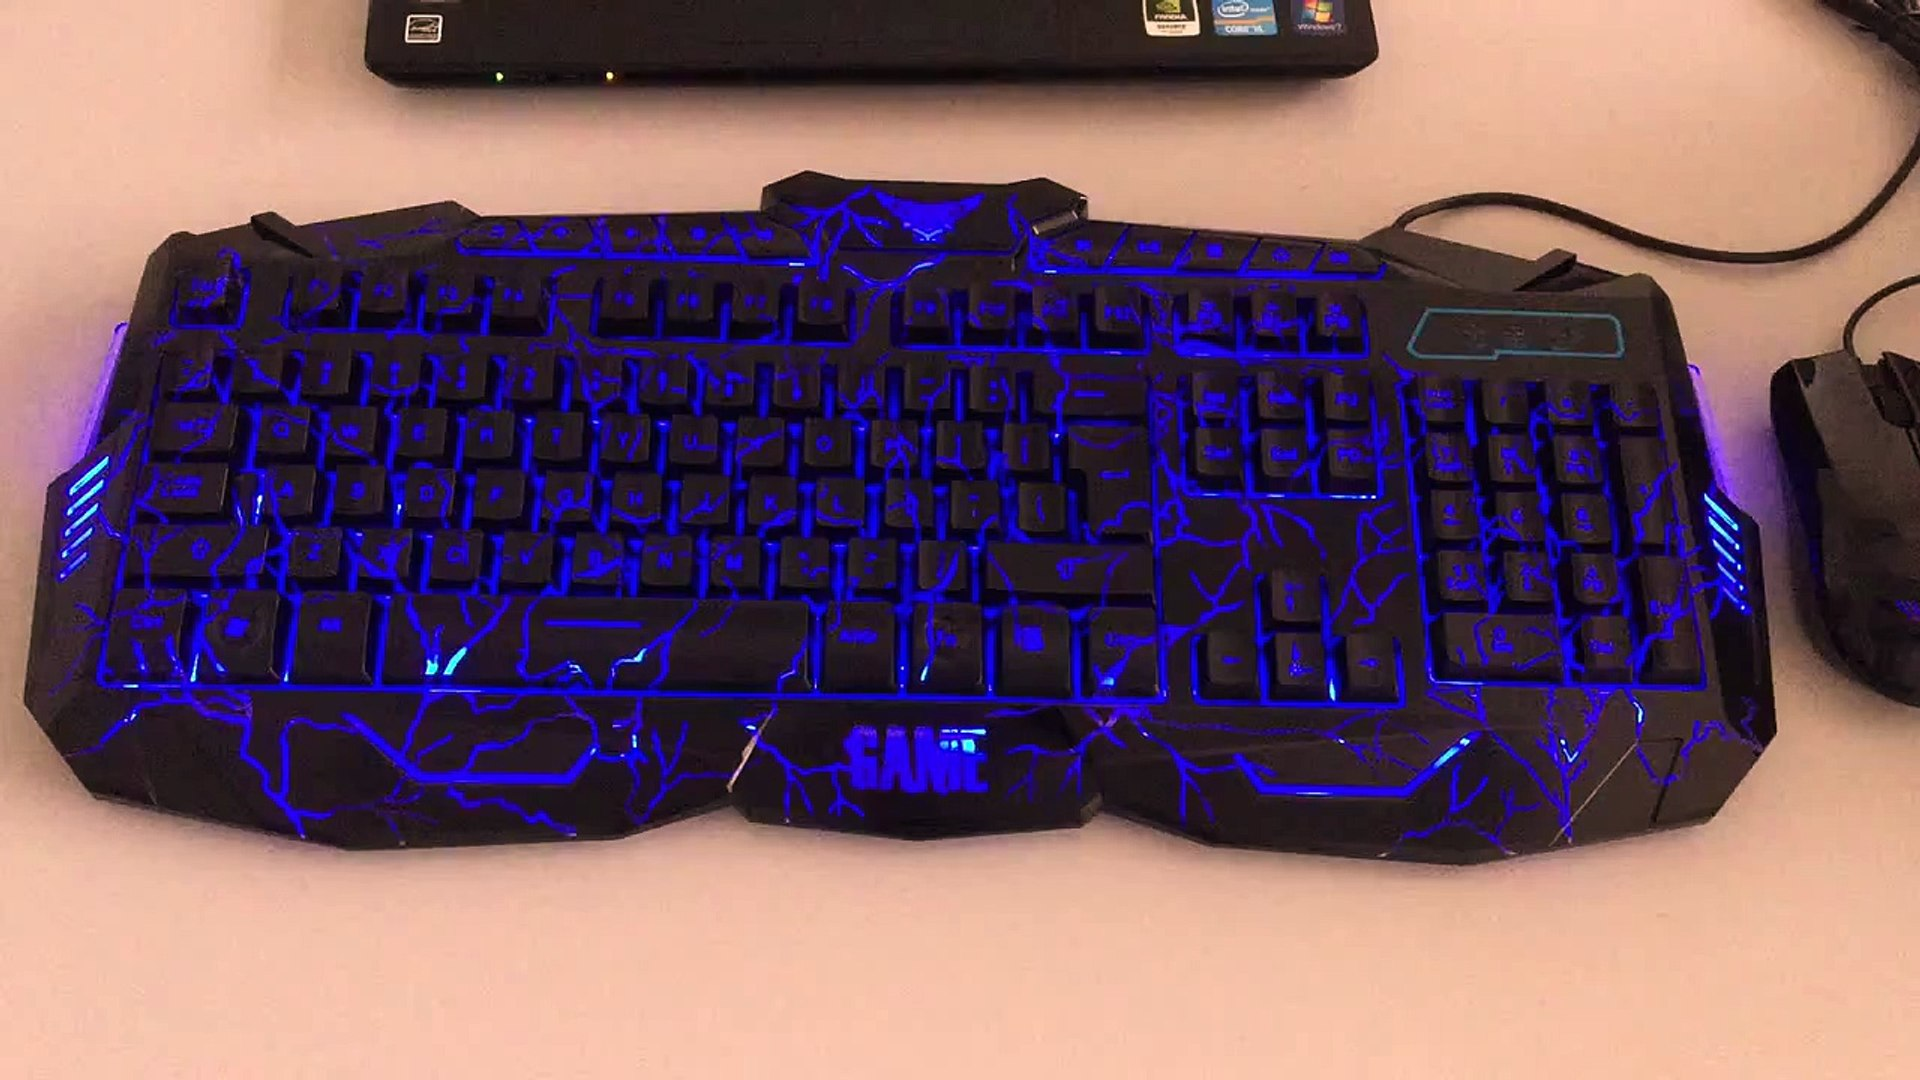 JM GAMING Three Color Adjustable Blue Red Purple LED Illuminated Gaming Keyboard